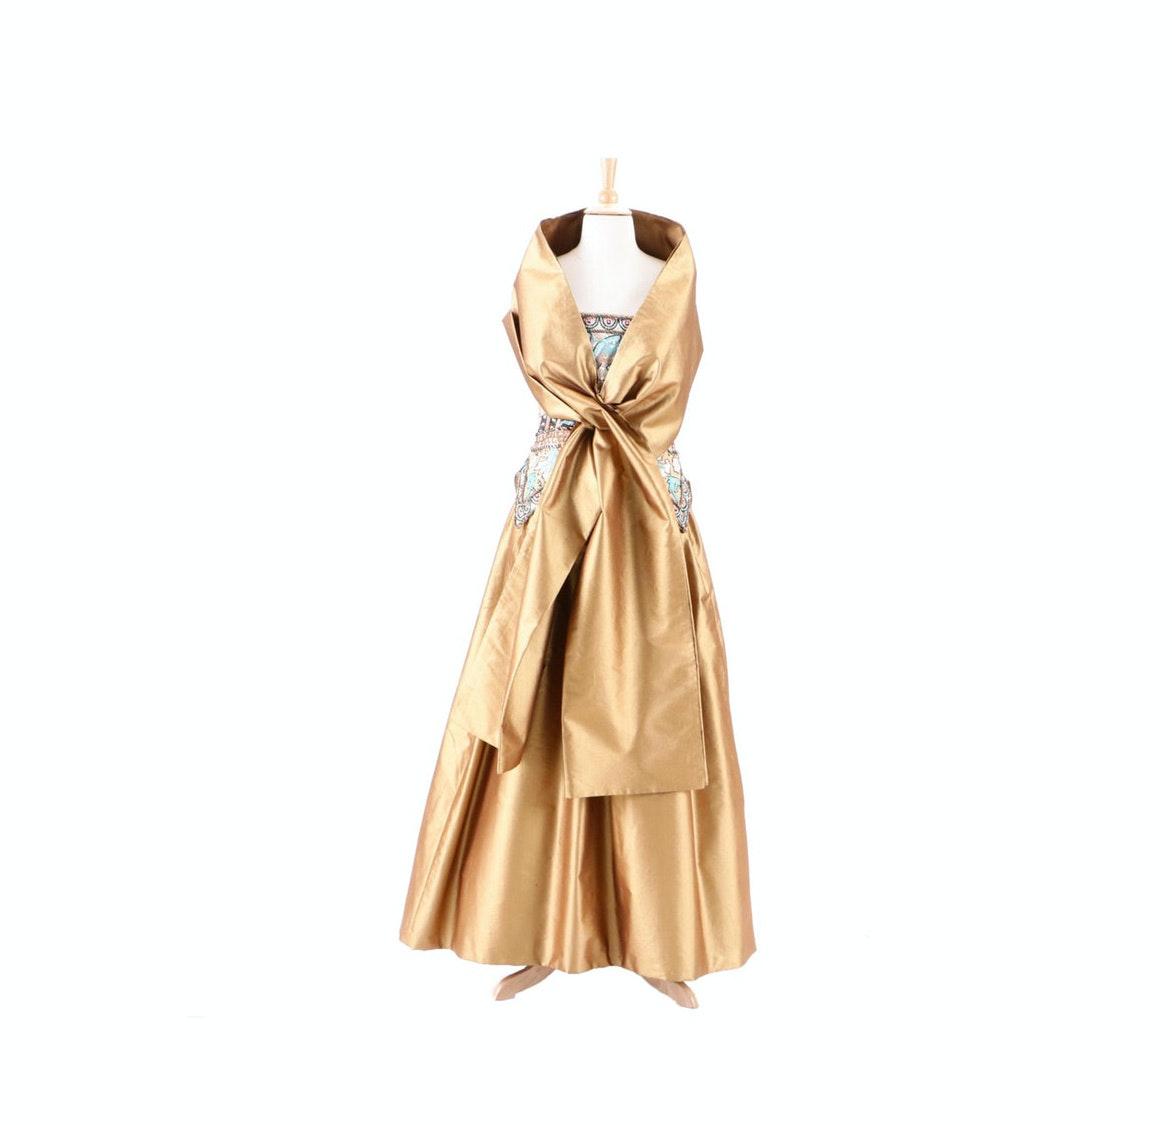 Vintage Fashion, Designer Accessories & More